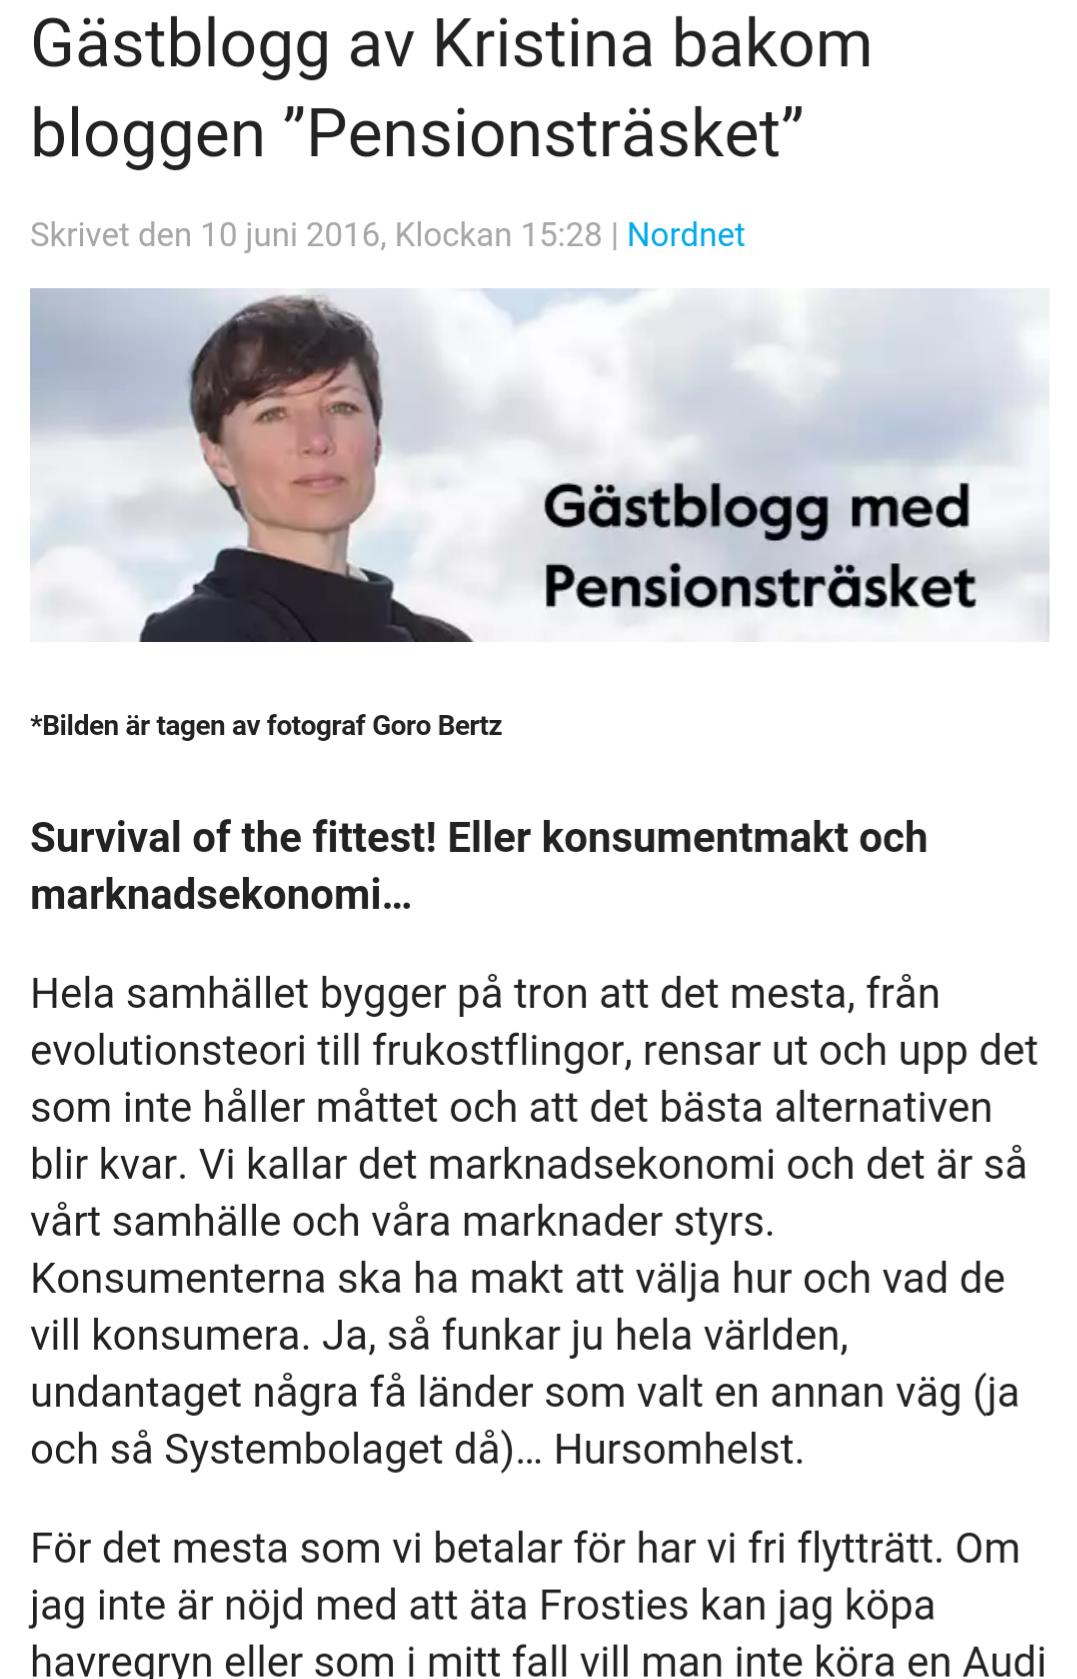 2016-06: Nordnet Gästblogg